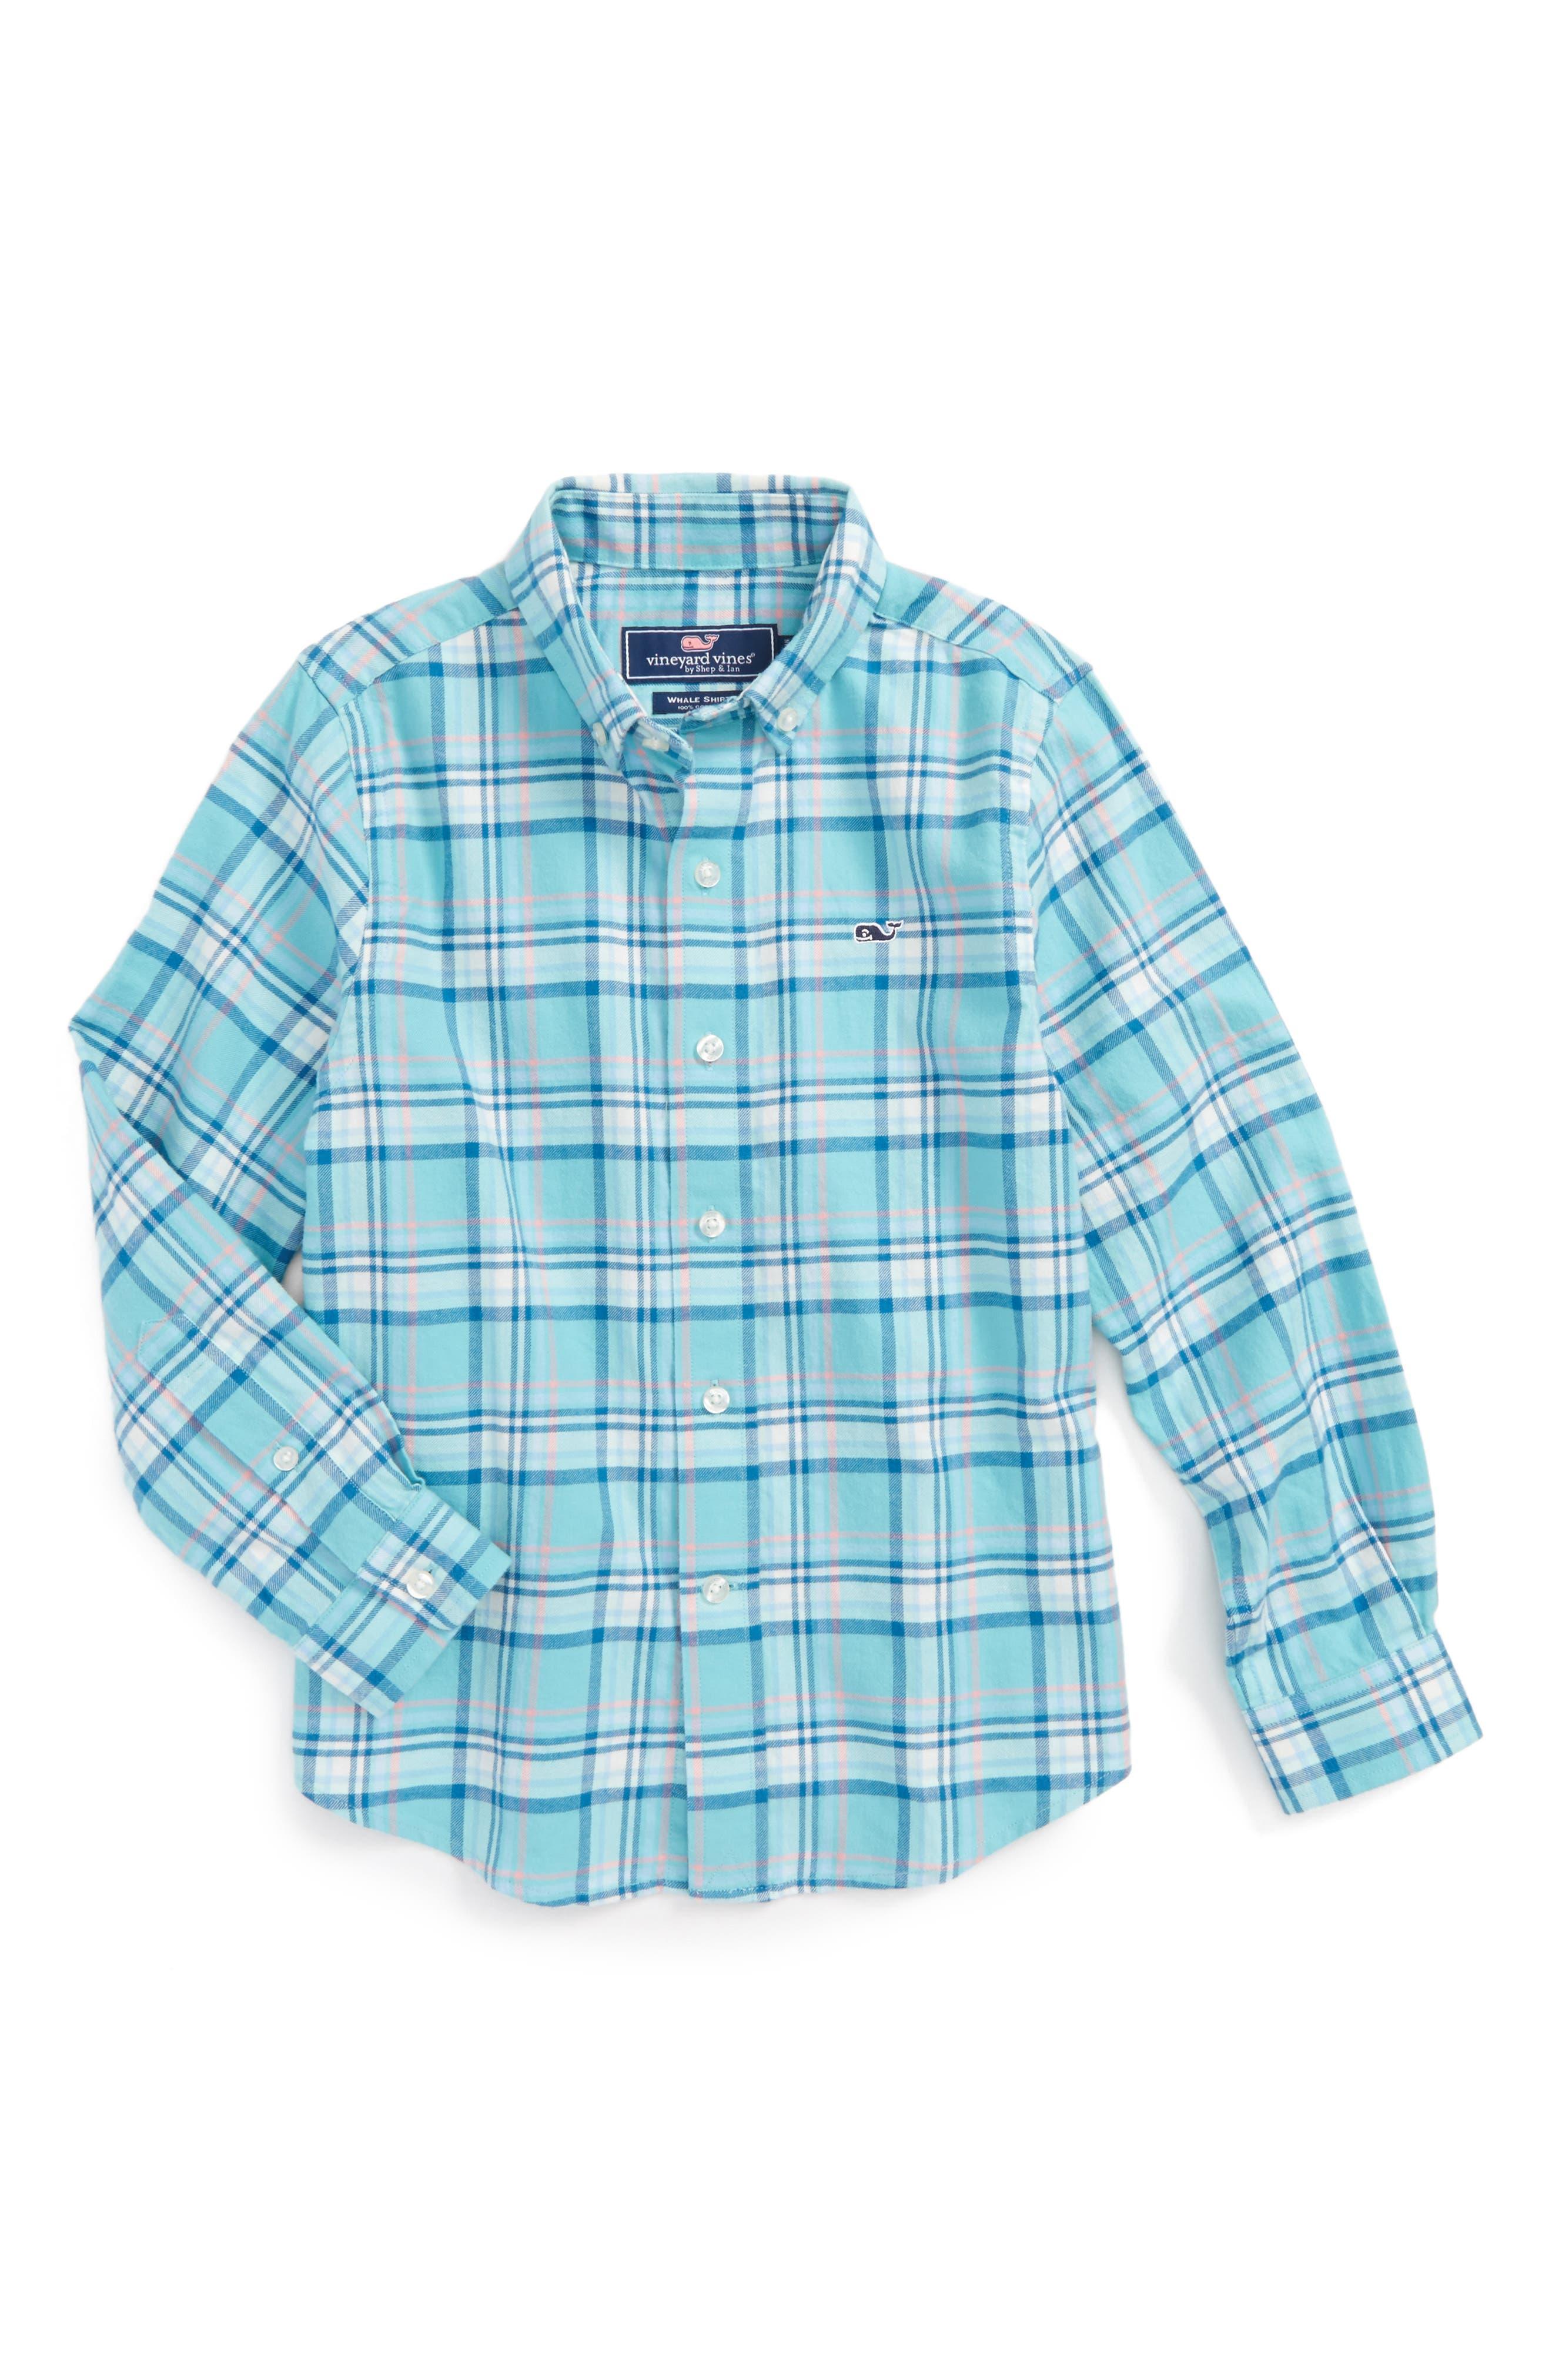 Main Image - vineyard vines Loblolly Plaid Shirt (Toddler Boys & Little Boys)